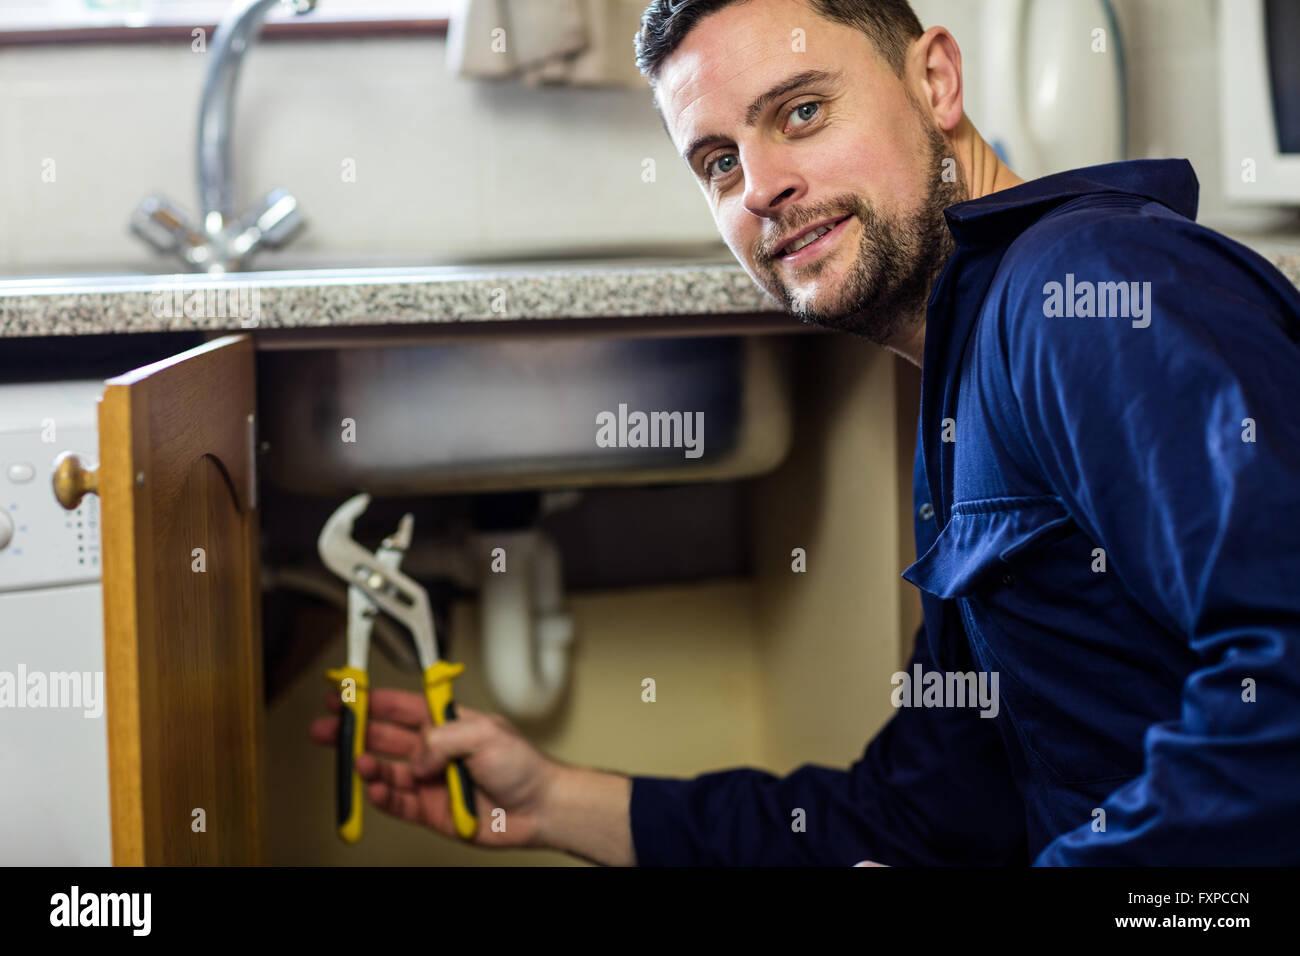 Portrait of plumber repairing a sink - Stock Image